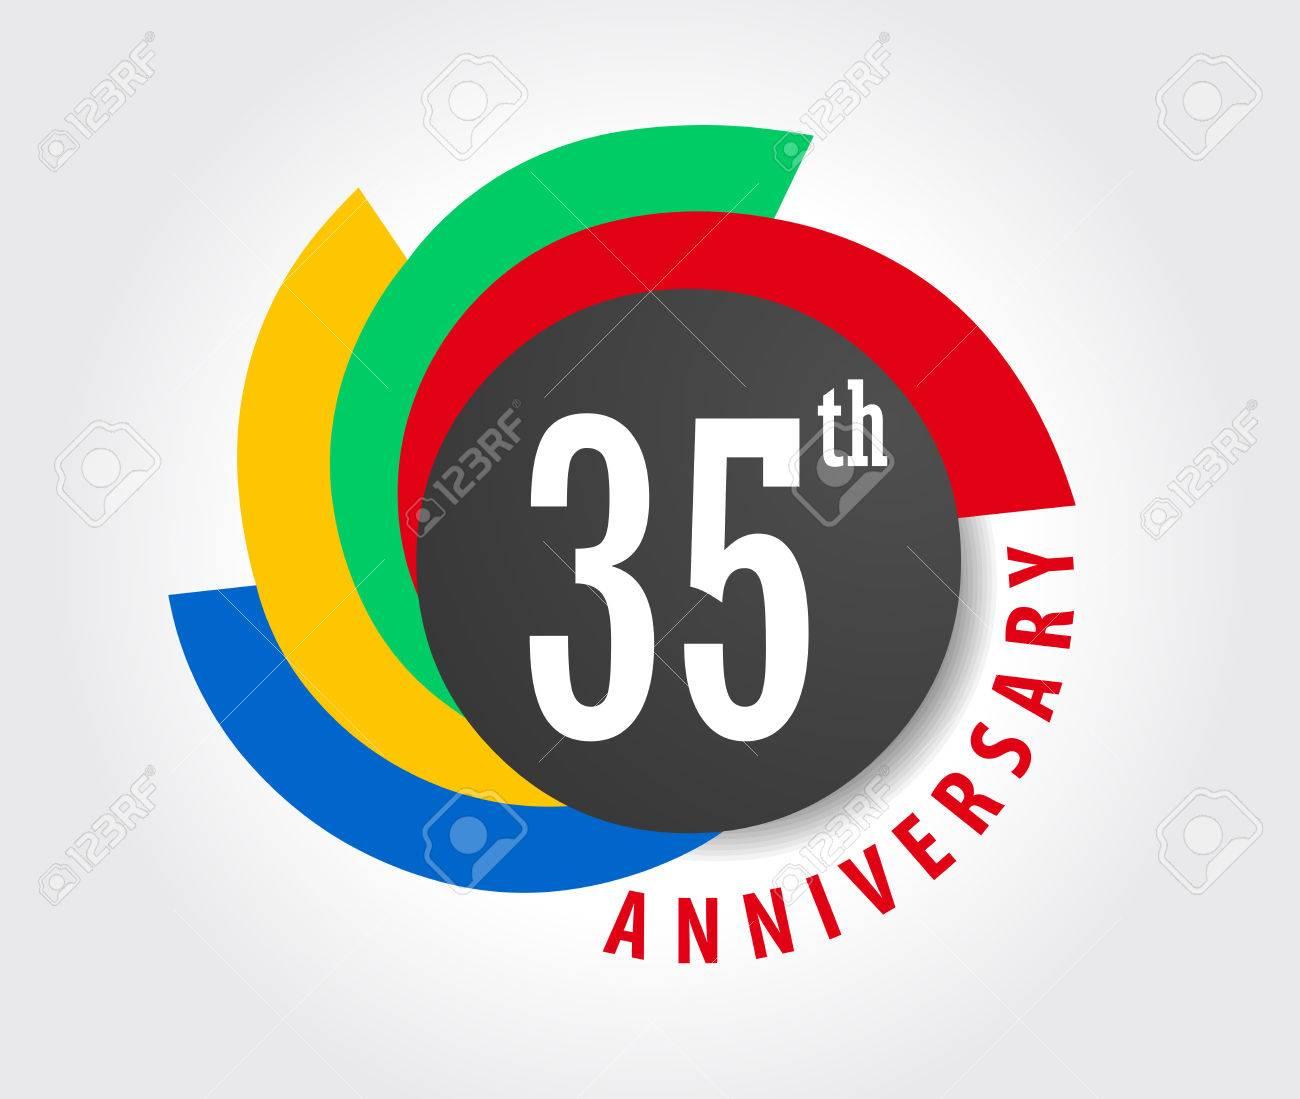 35th Anniversary celebration background, 35 years anniversary card illustration - 59937284